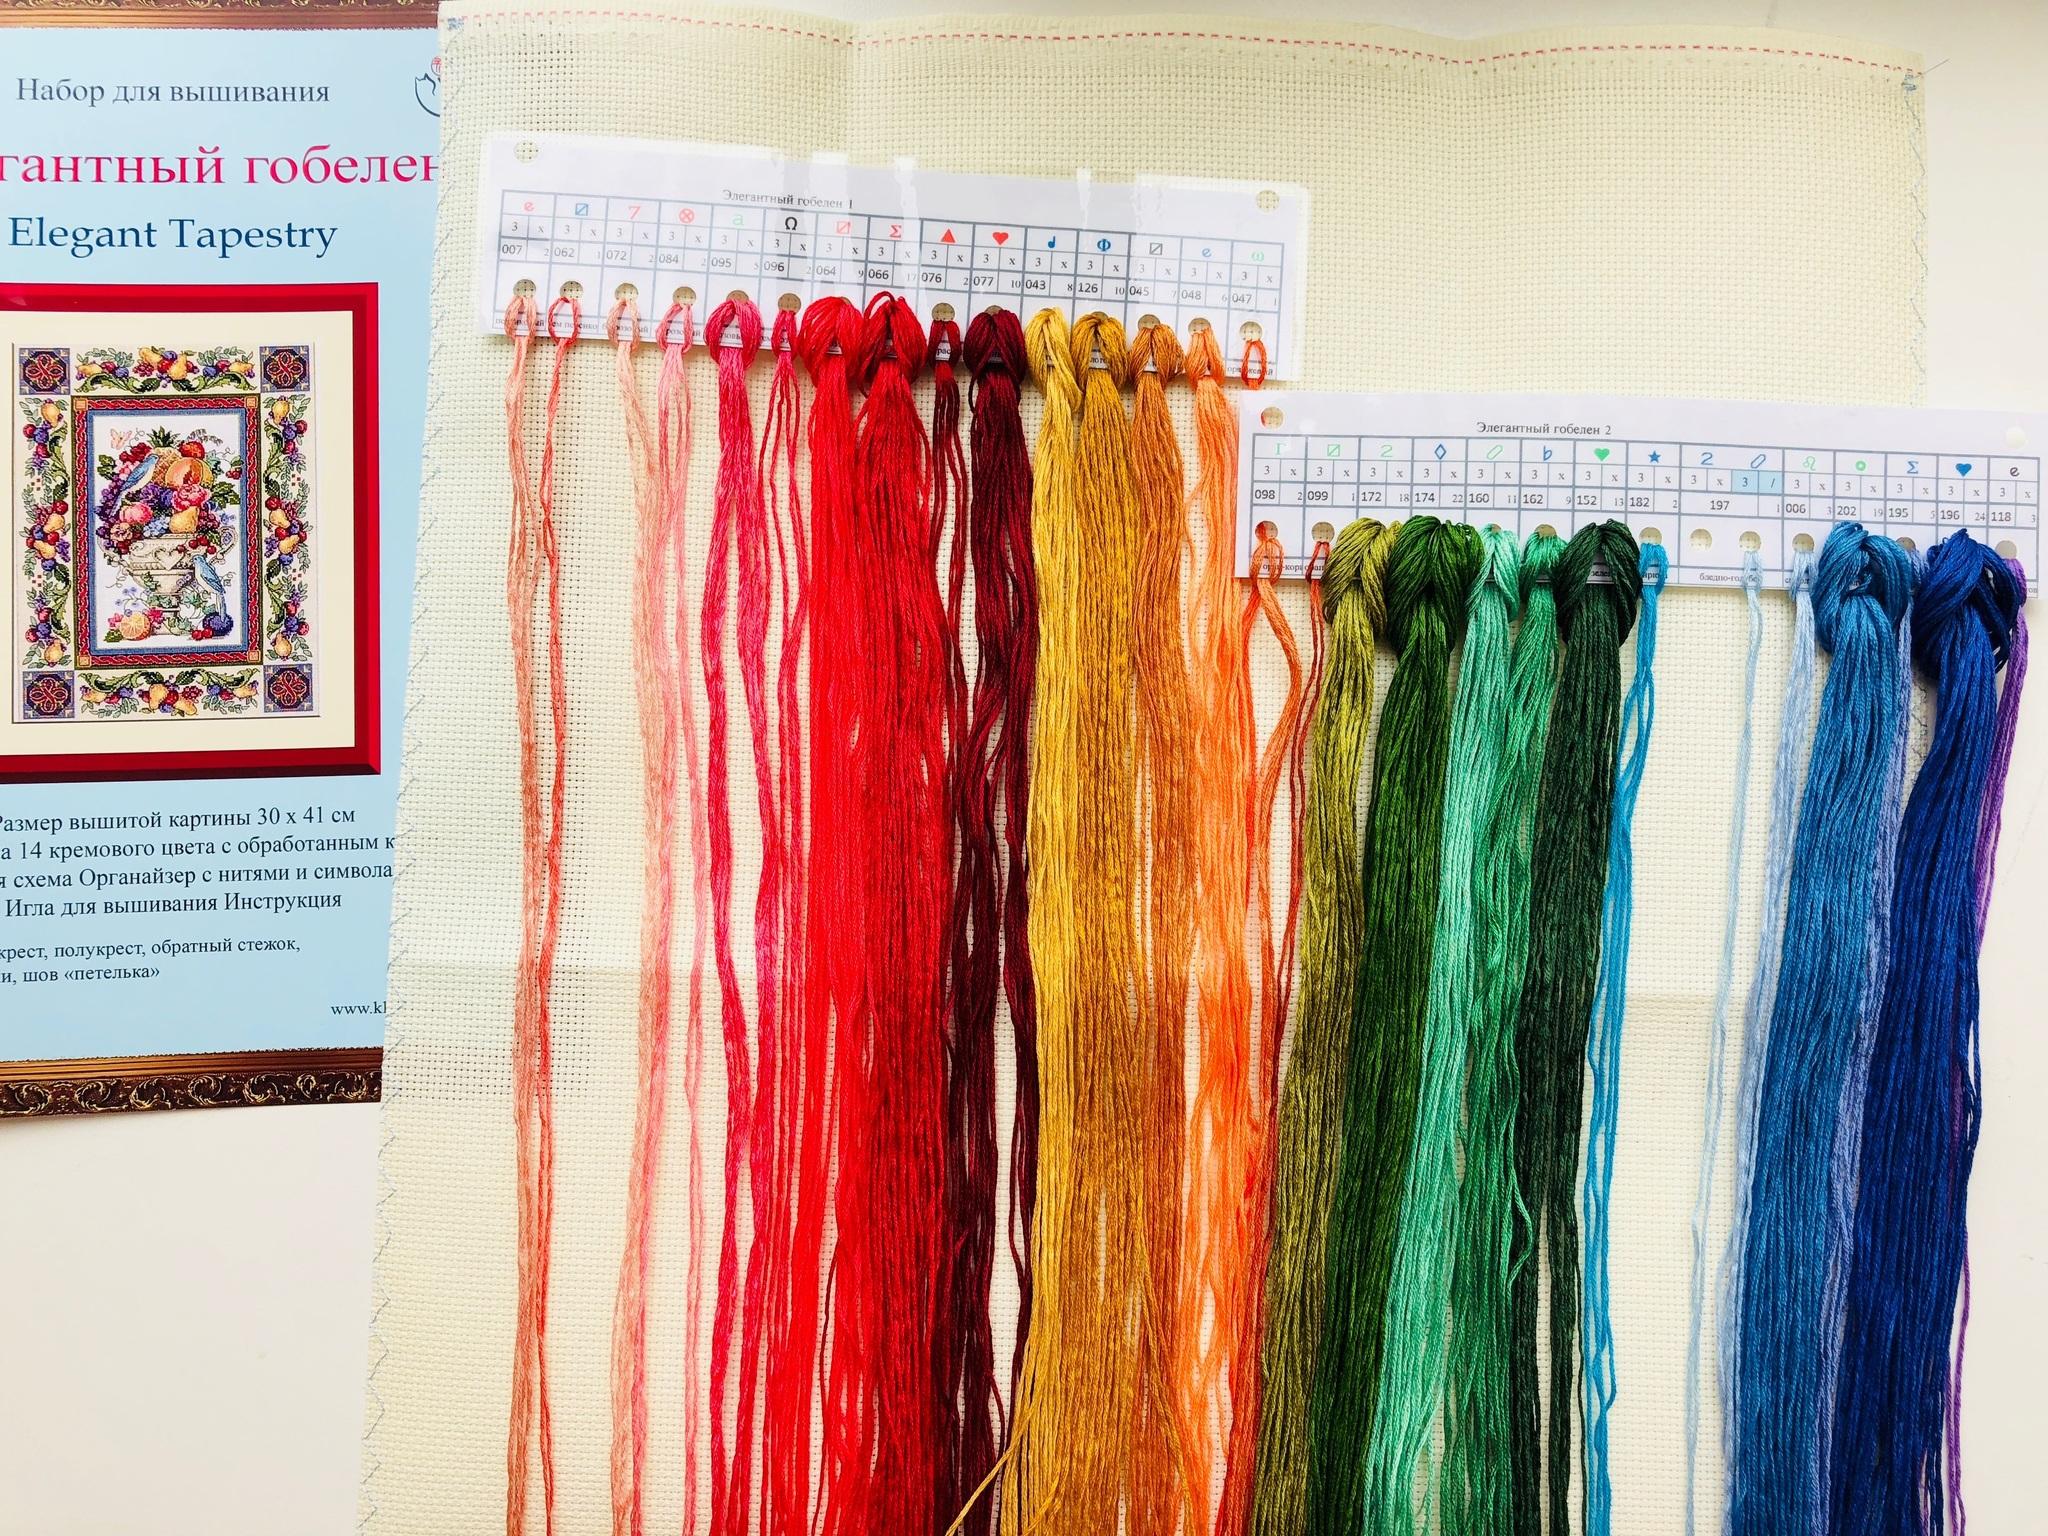 Набор для вышивания  Элегантный гобелен. Elegant Tapestry. Арт. 3793